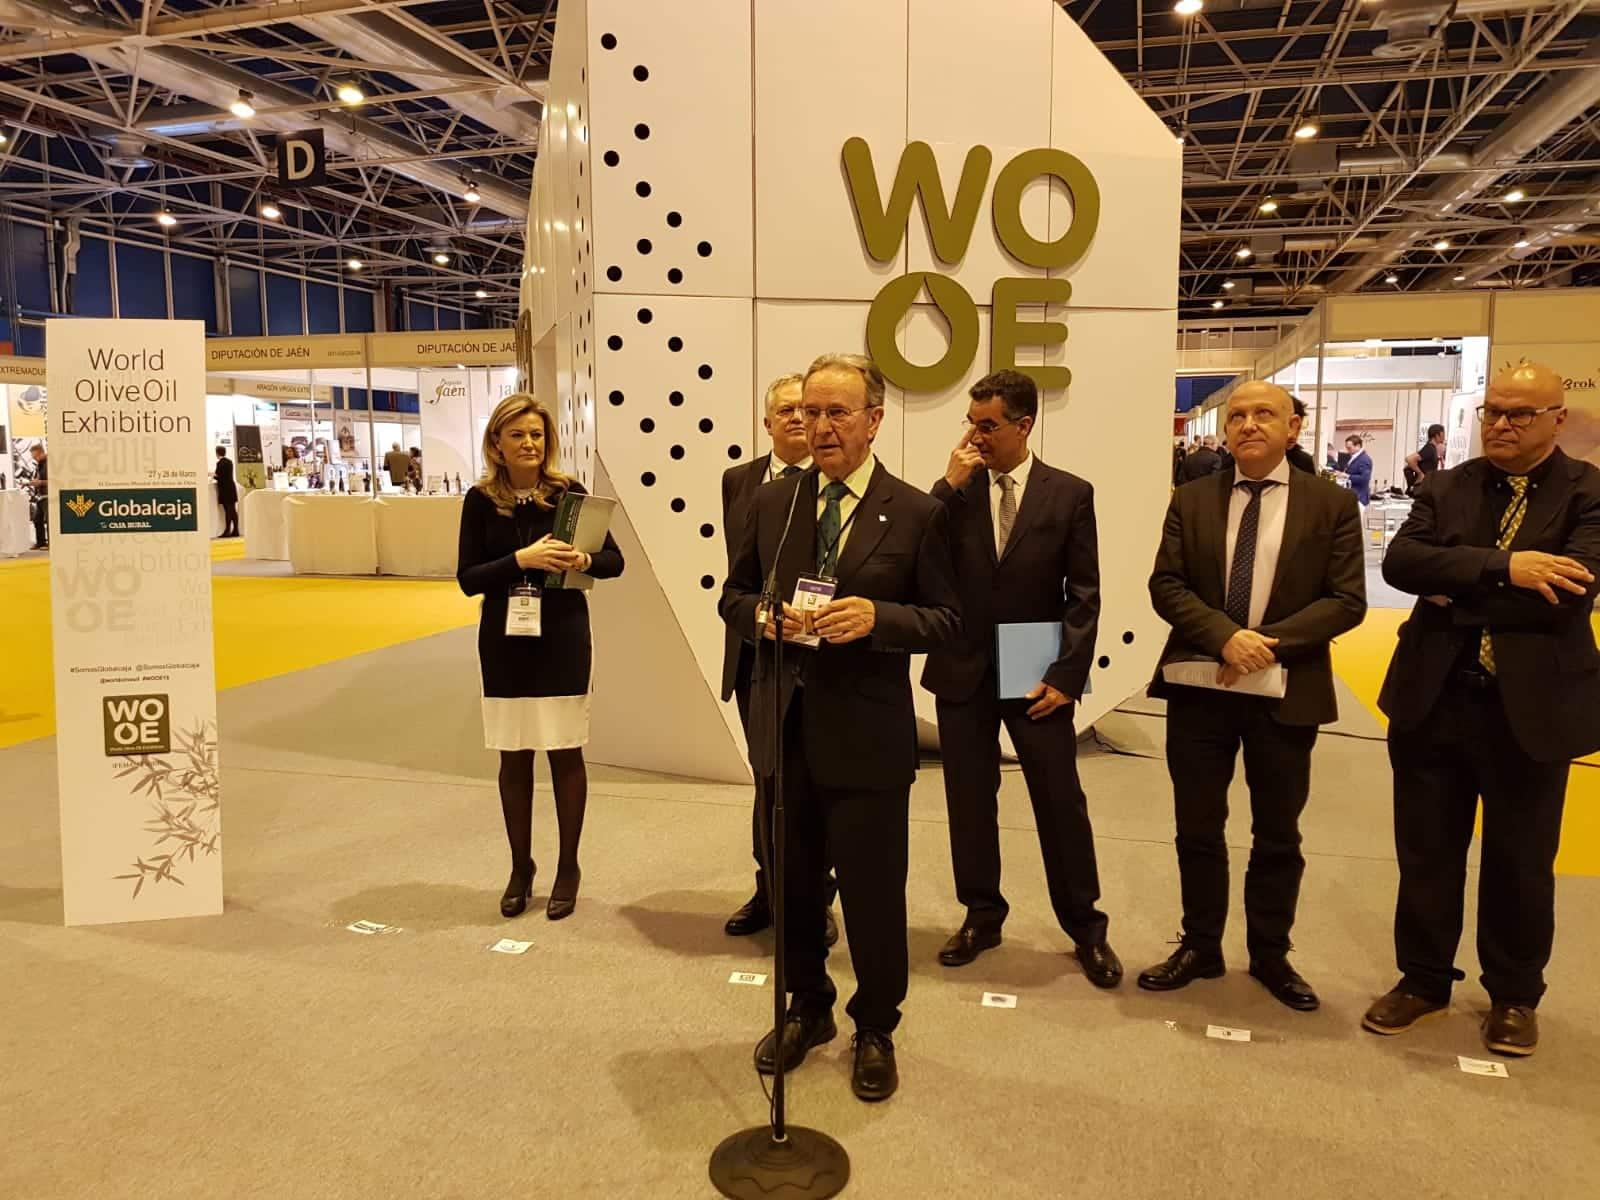 https://blog.globalcaja.es/wp-content/uploads/2019/03/Inauguracion-WOOE.jpg